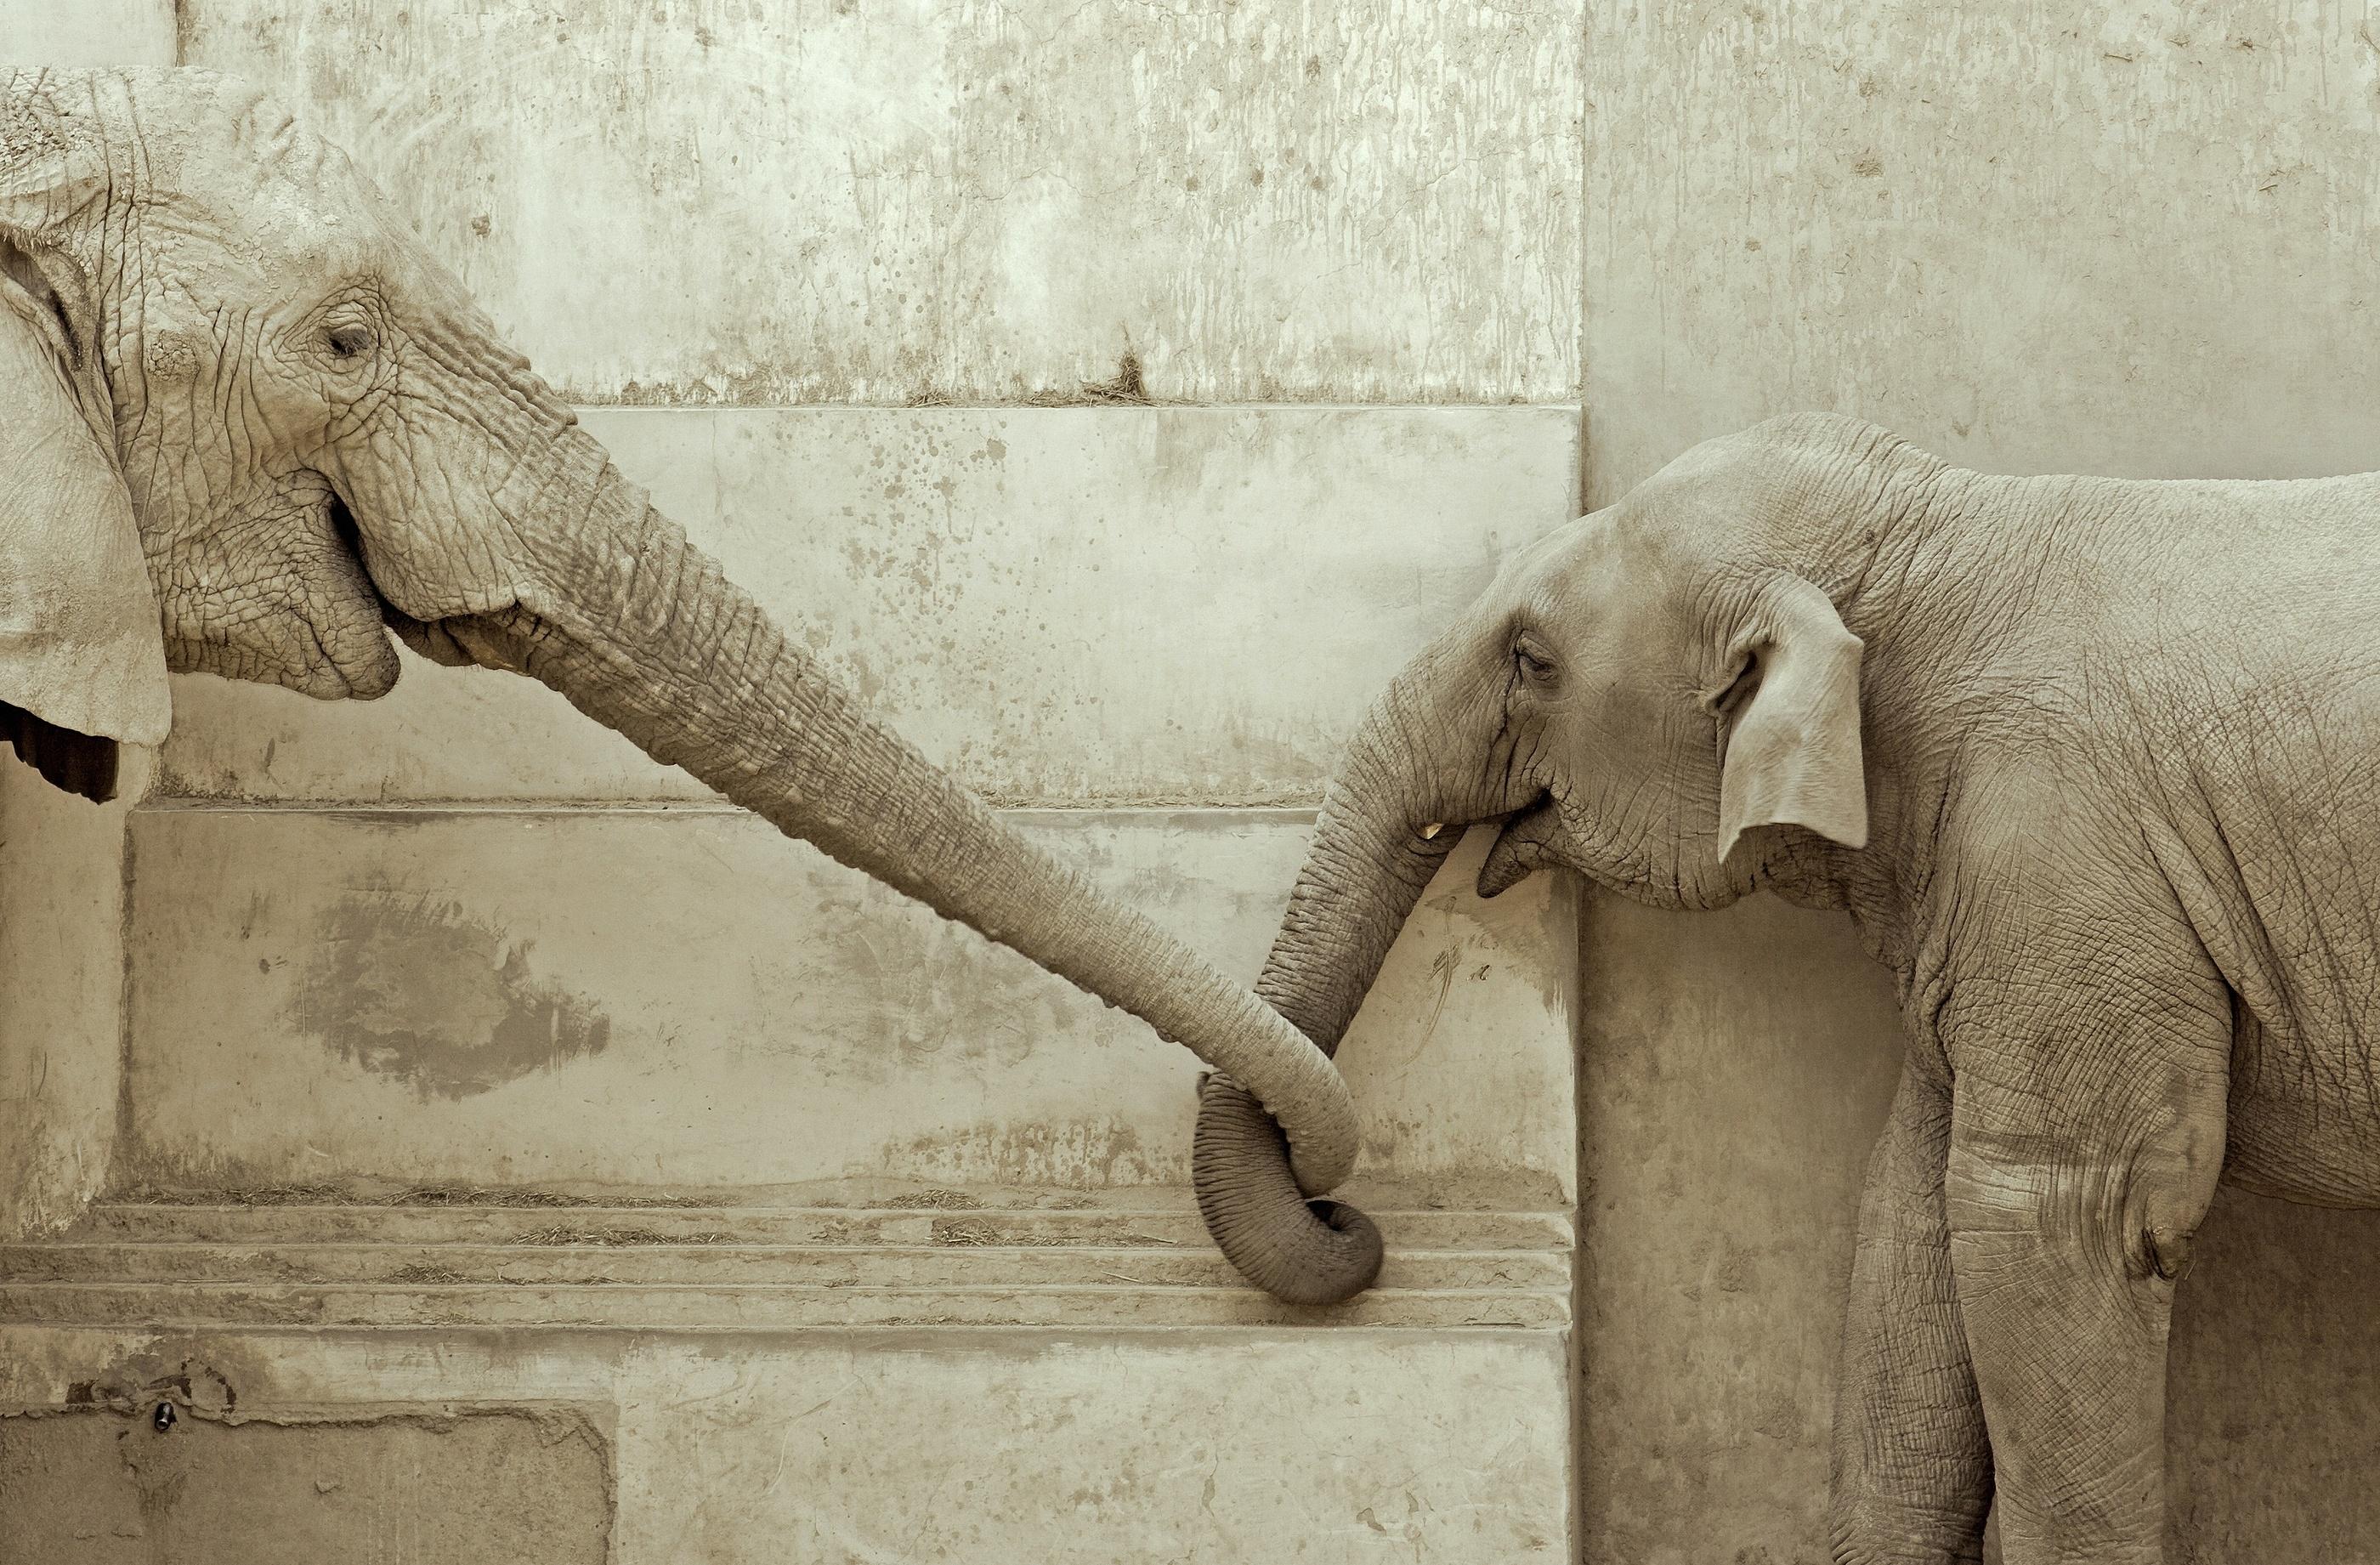 elephants_trunks.jpg